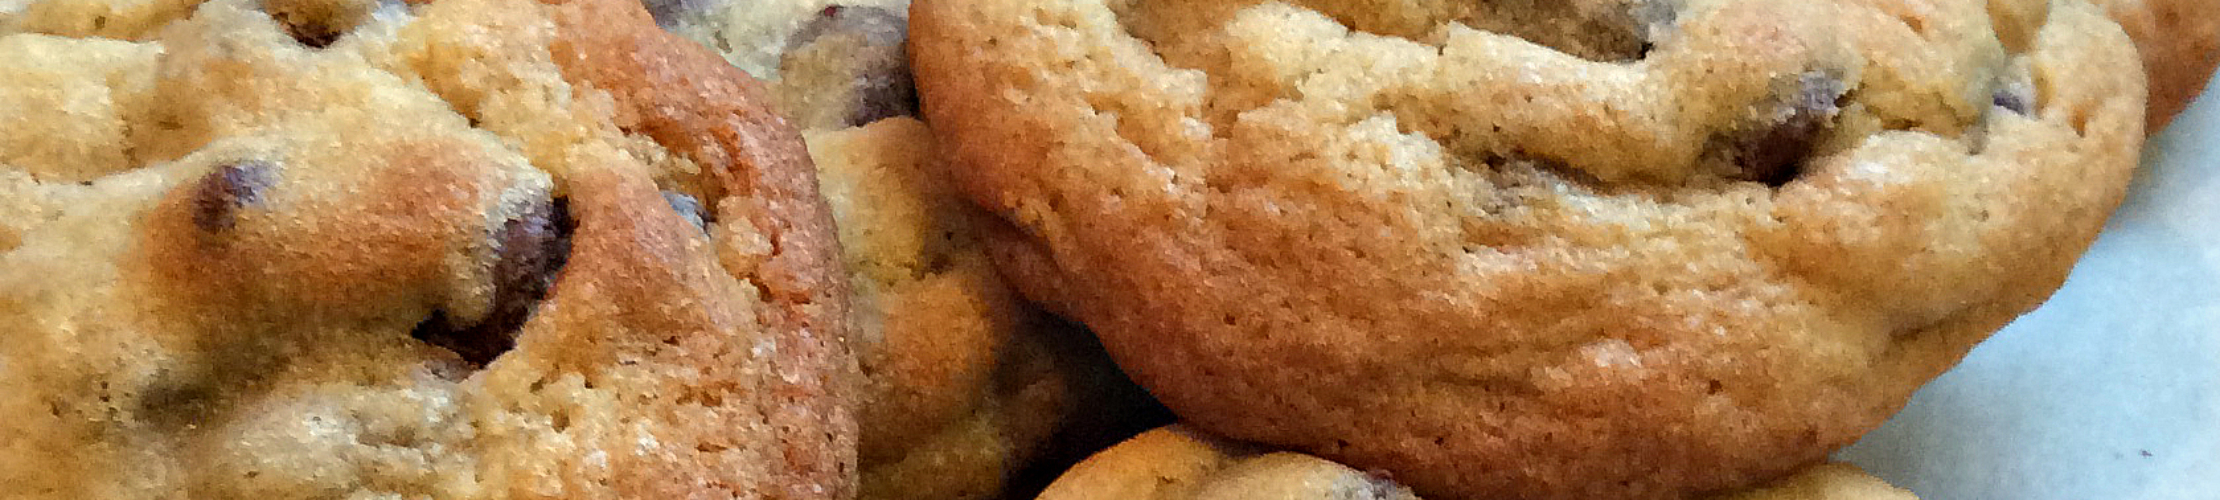 aspiring-home-chocolate-chip-cookies-recipe